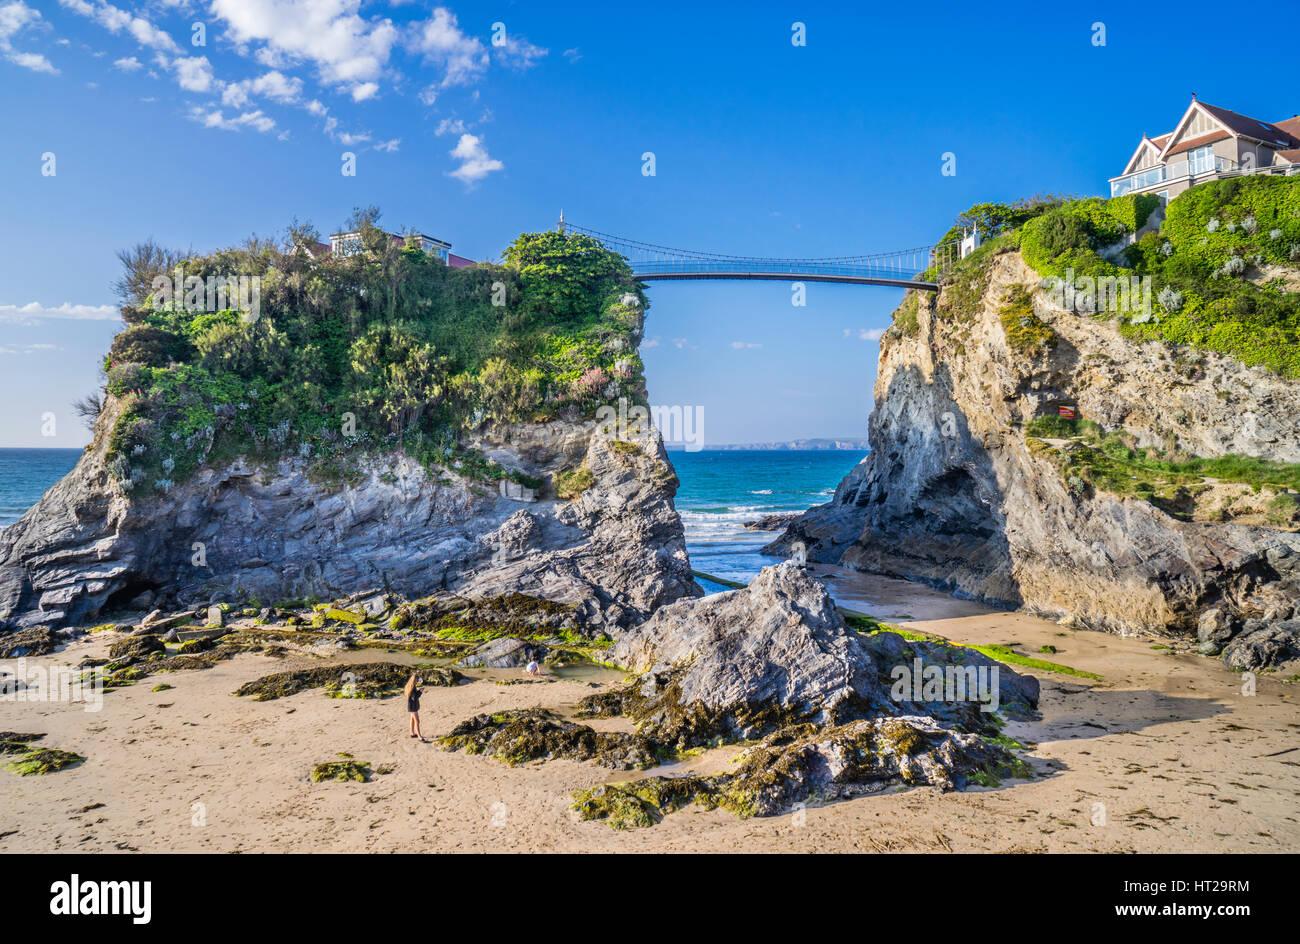 United Kingdom, South West England, Cornwall, Newquay, 'House in the Sea' on Towan island at Towan Beach - Stock Image